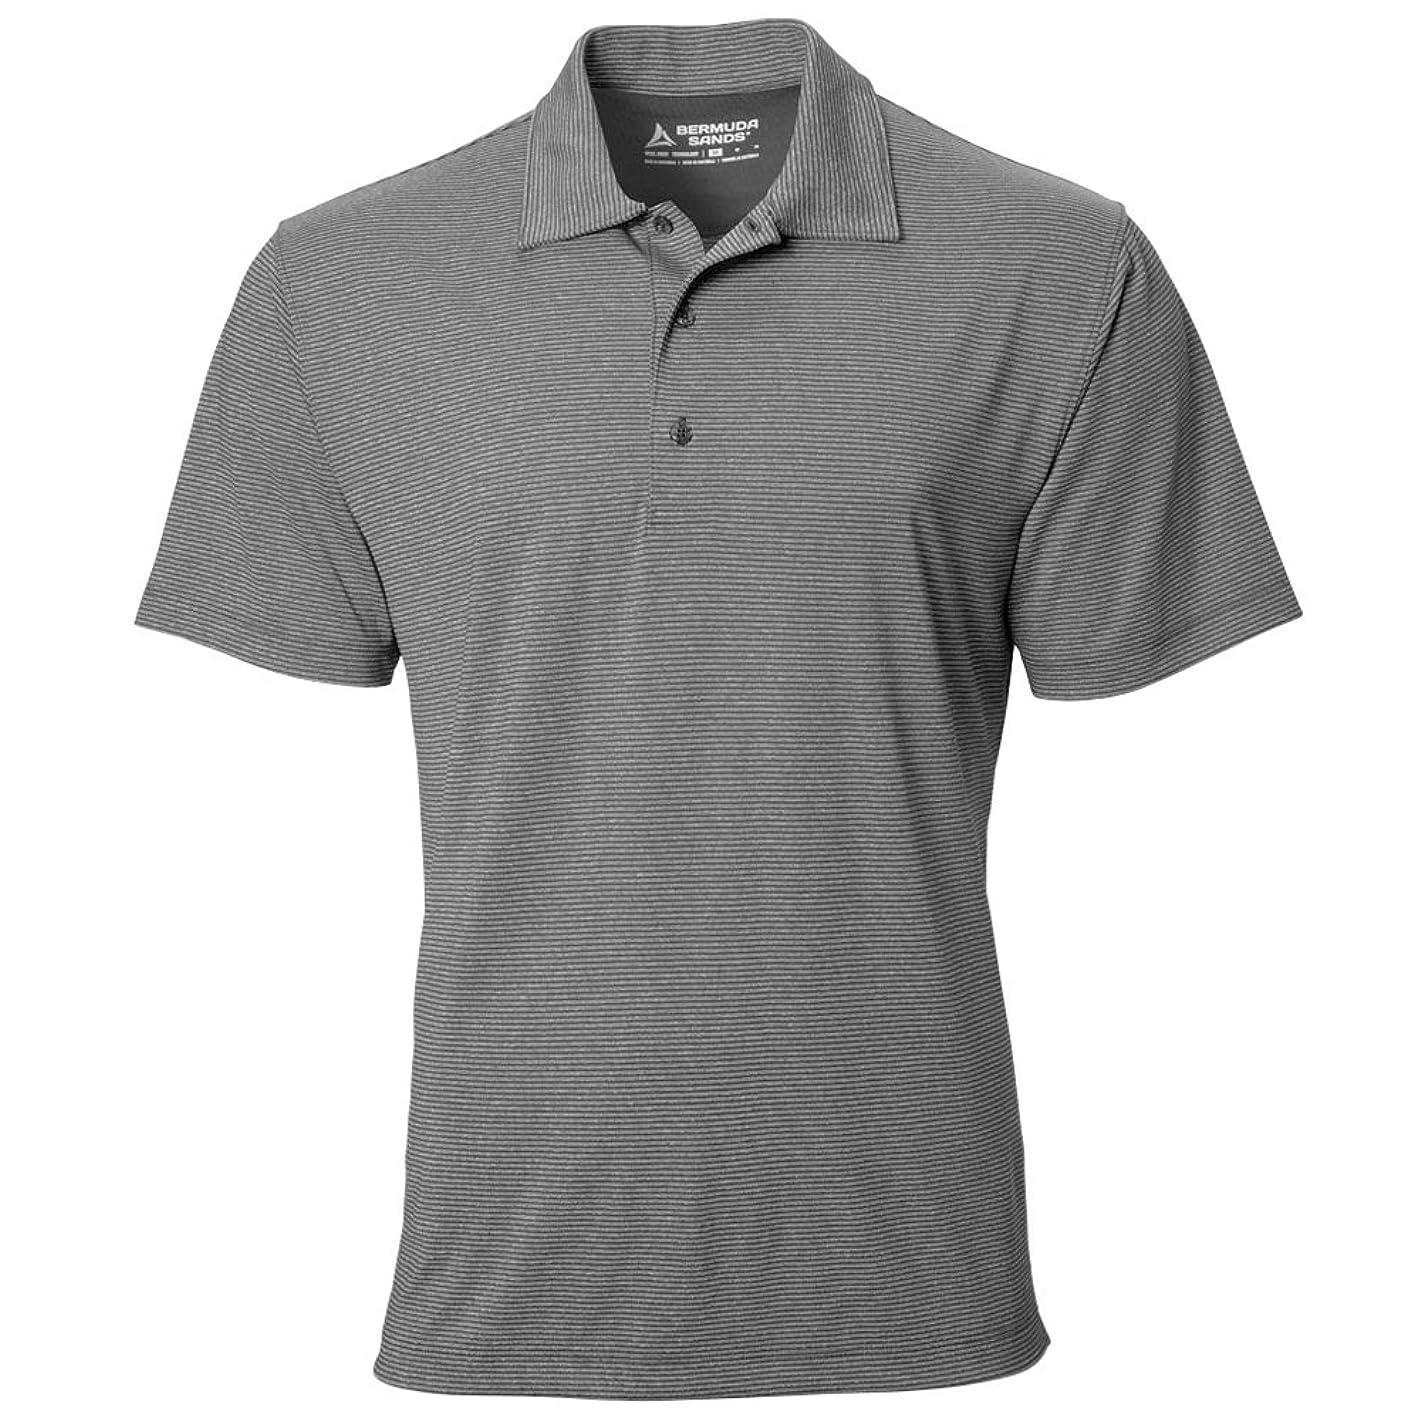 Bermuda Sands Elite Golf Polo Black Heather Medium